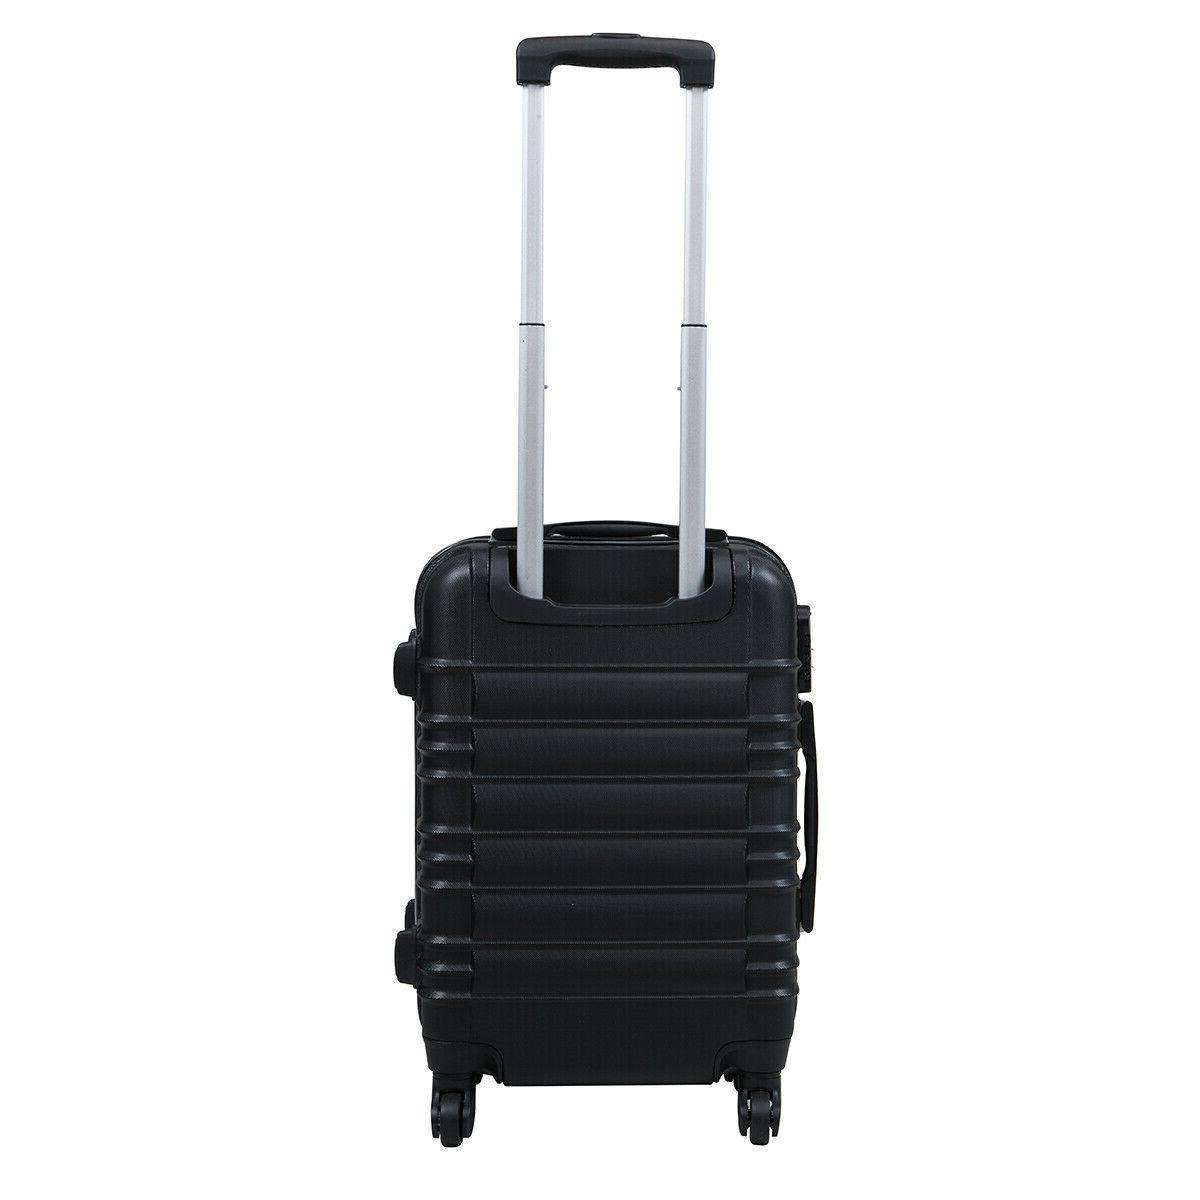 "20"" Luggage Travel Suitcase Lightweight Black"